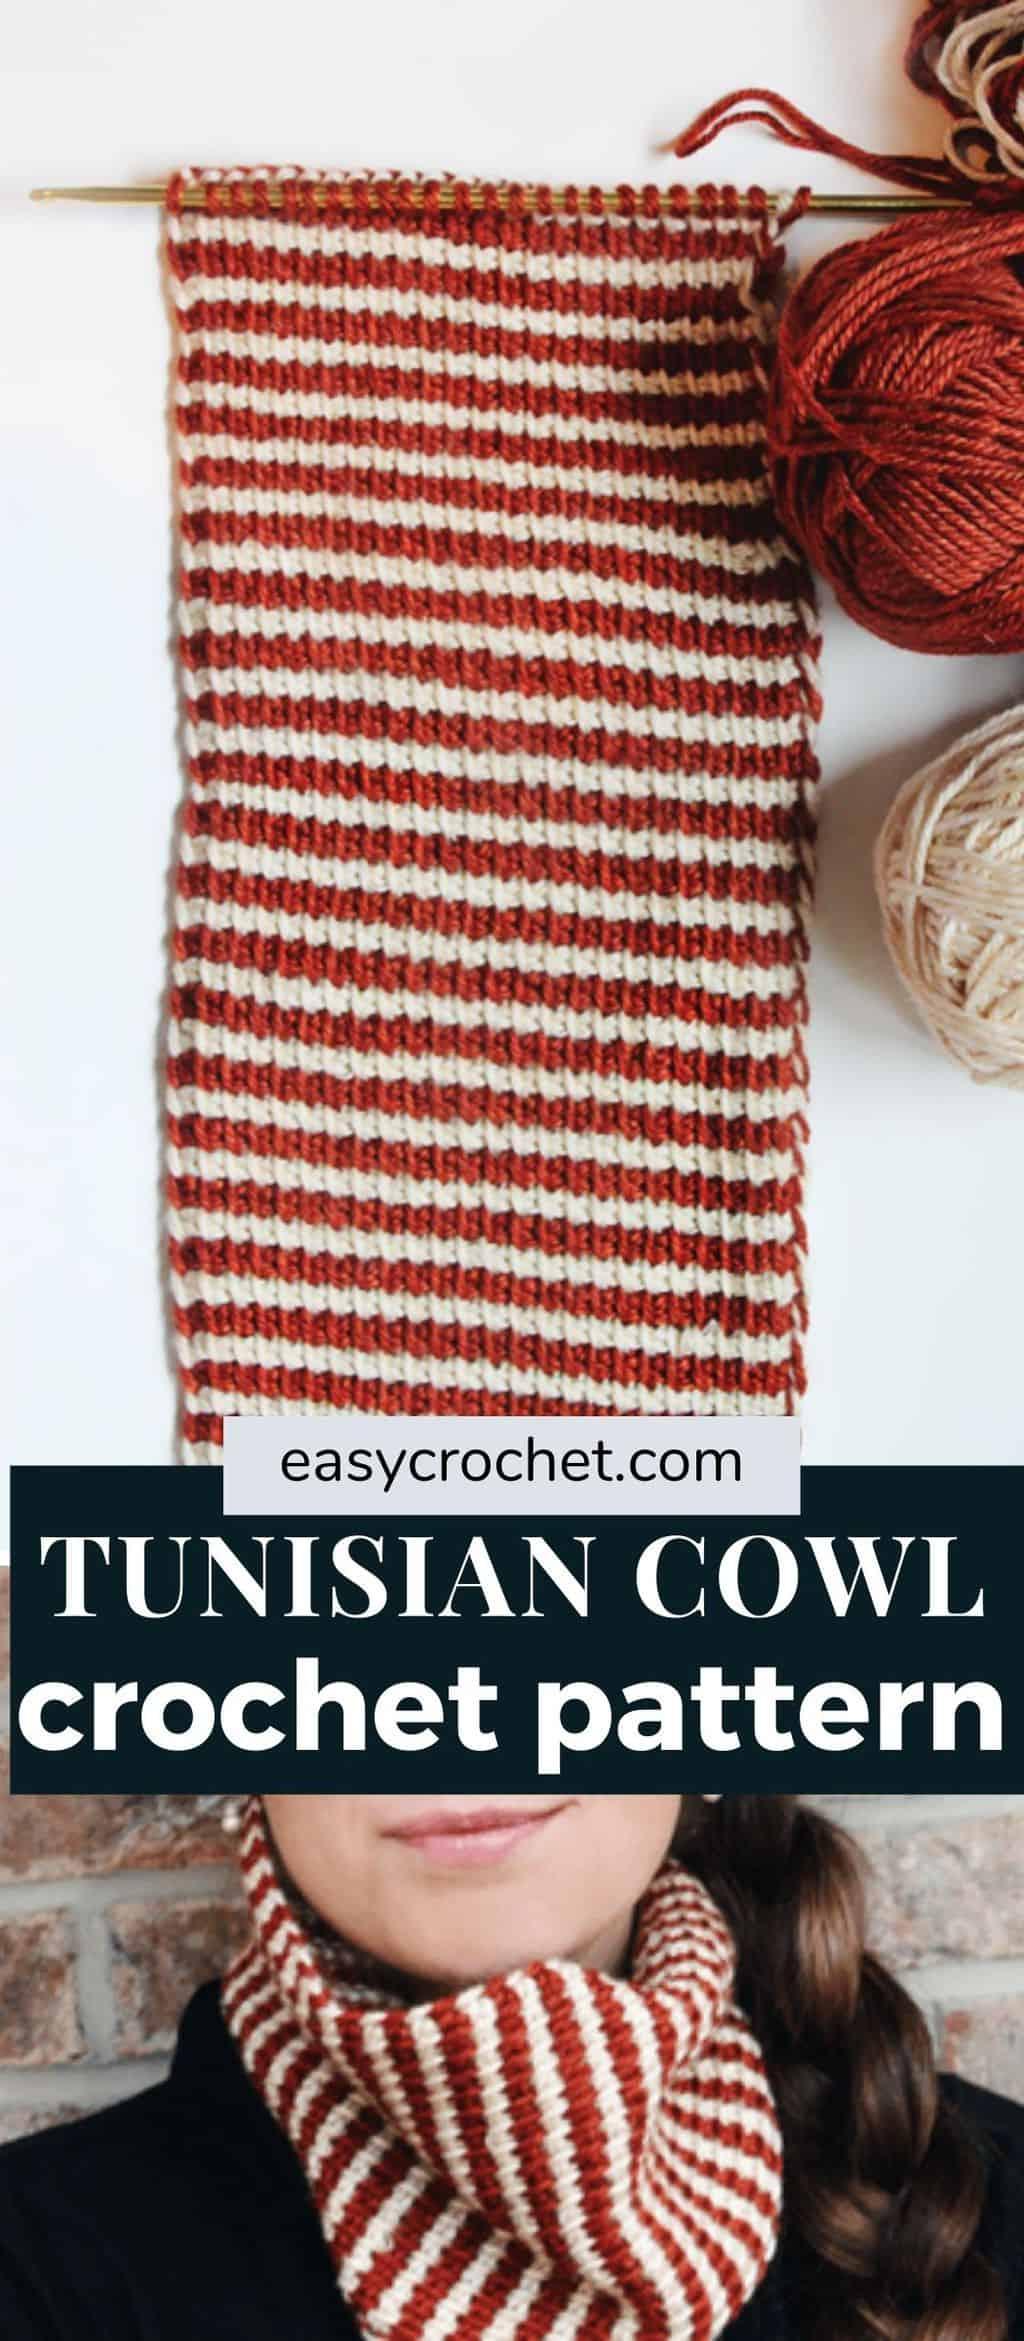 Tunisian cowl crochet pattern